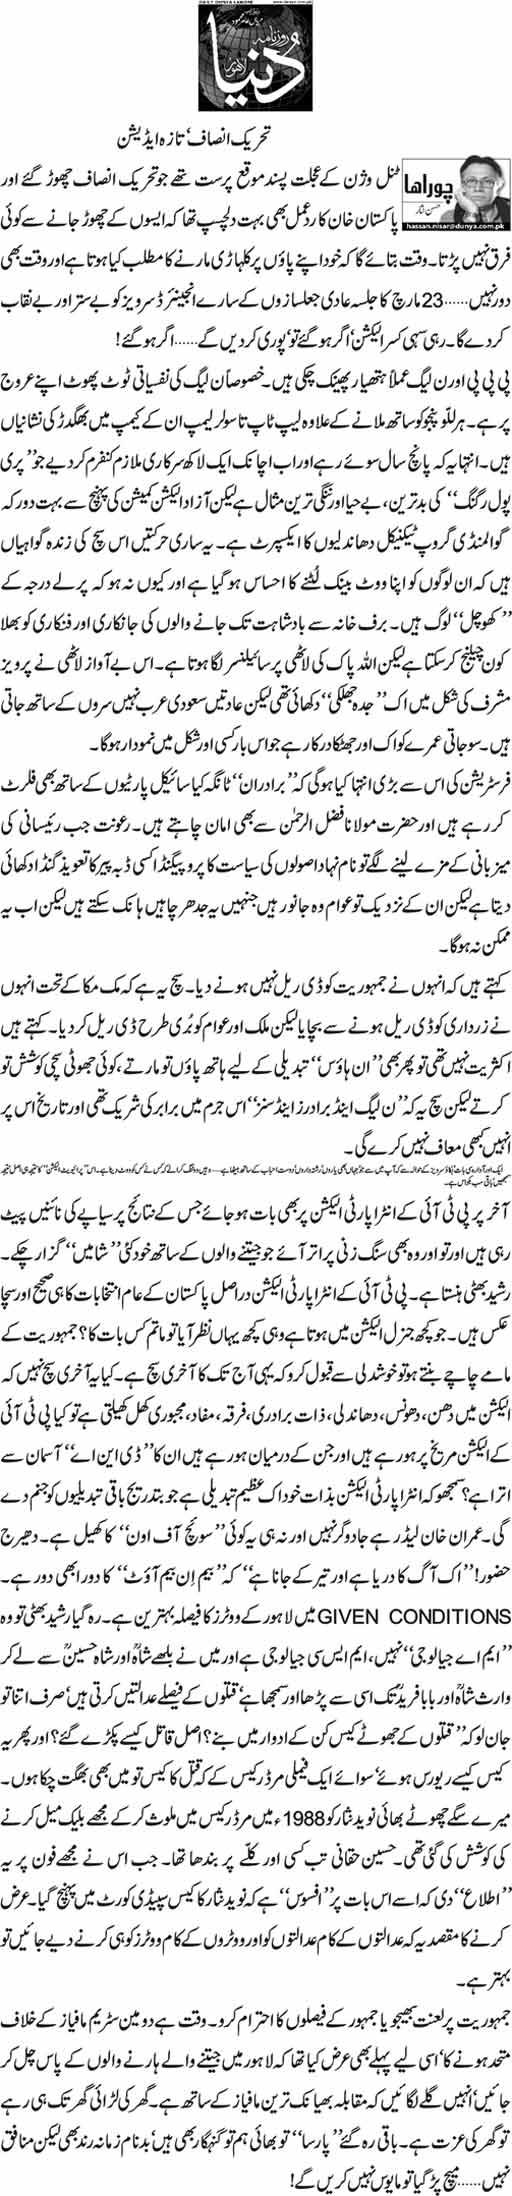 Tehreek e Insaf'Taza edition - Hassan Nisar